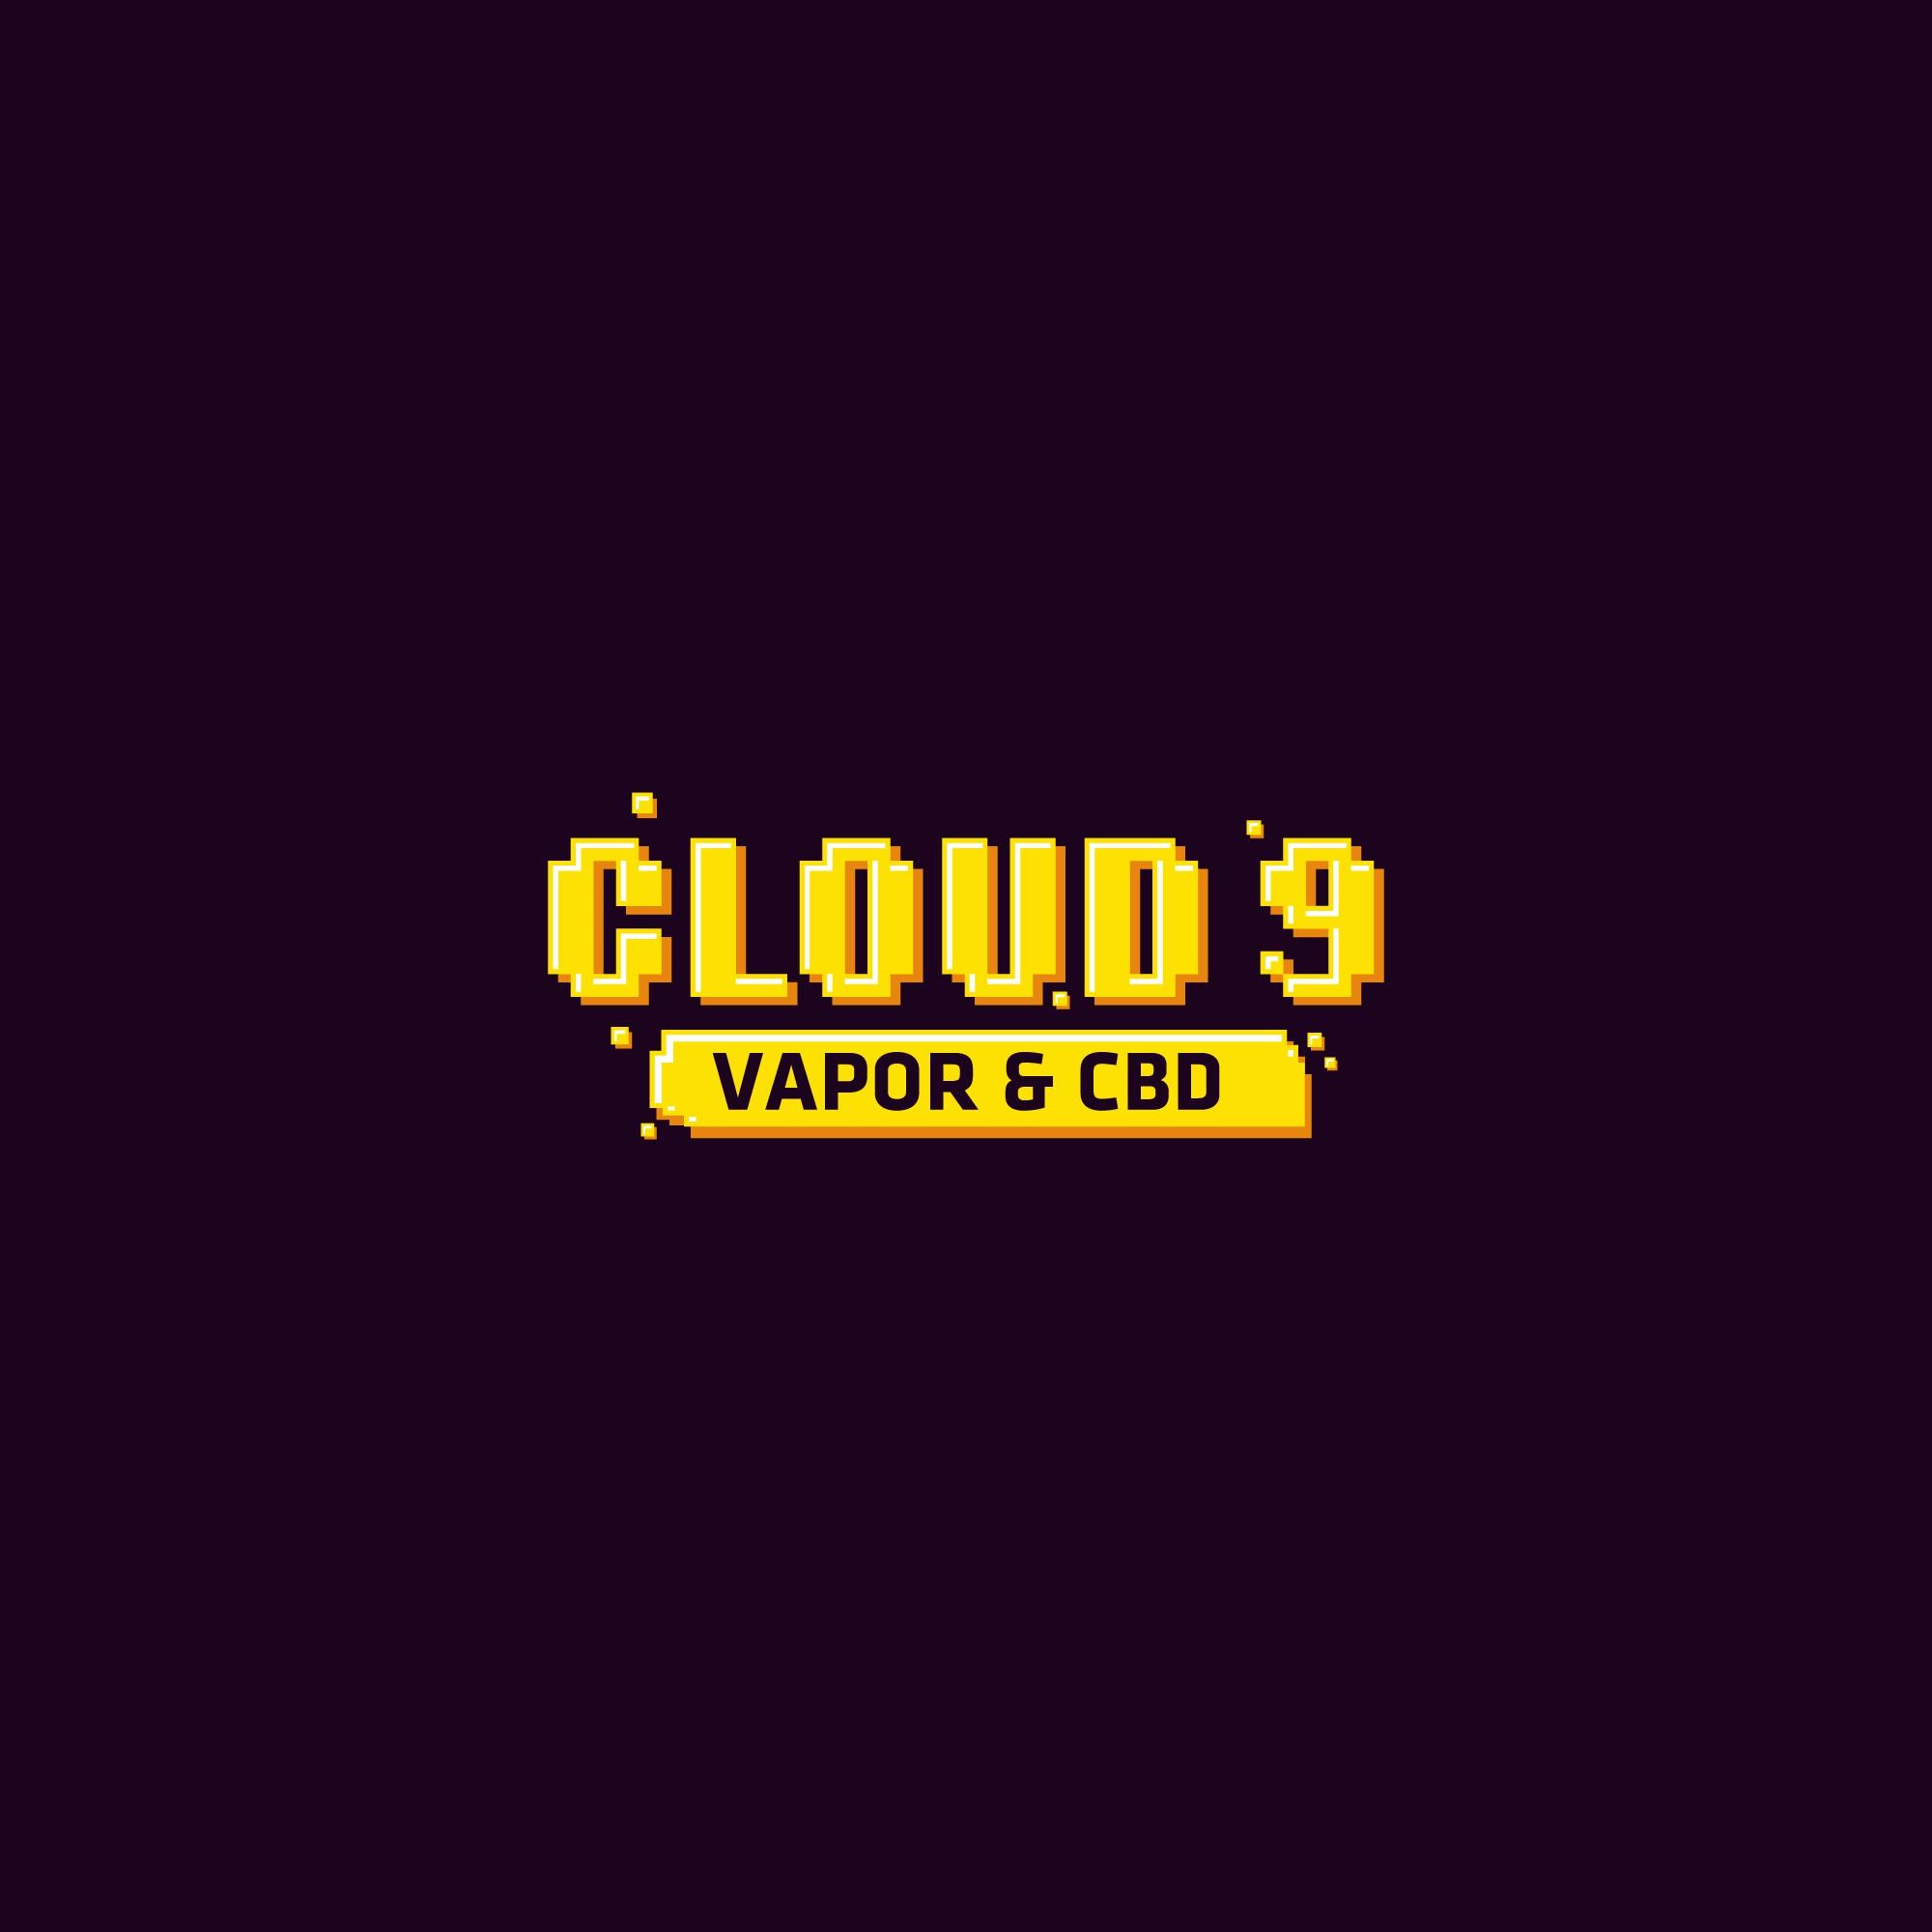 cloud 9 pixelated logo